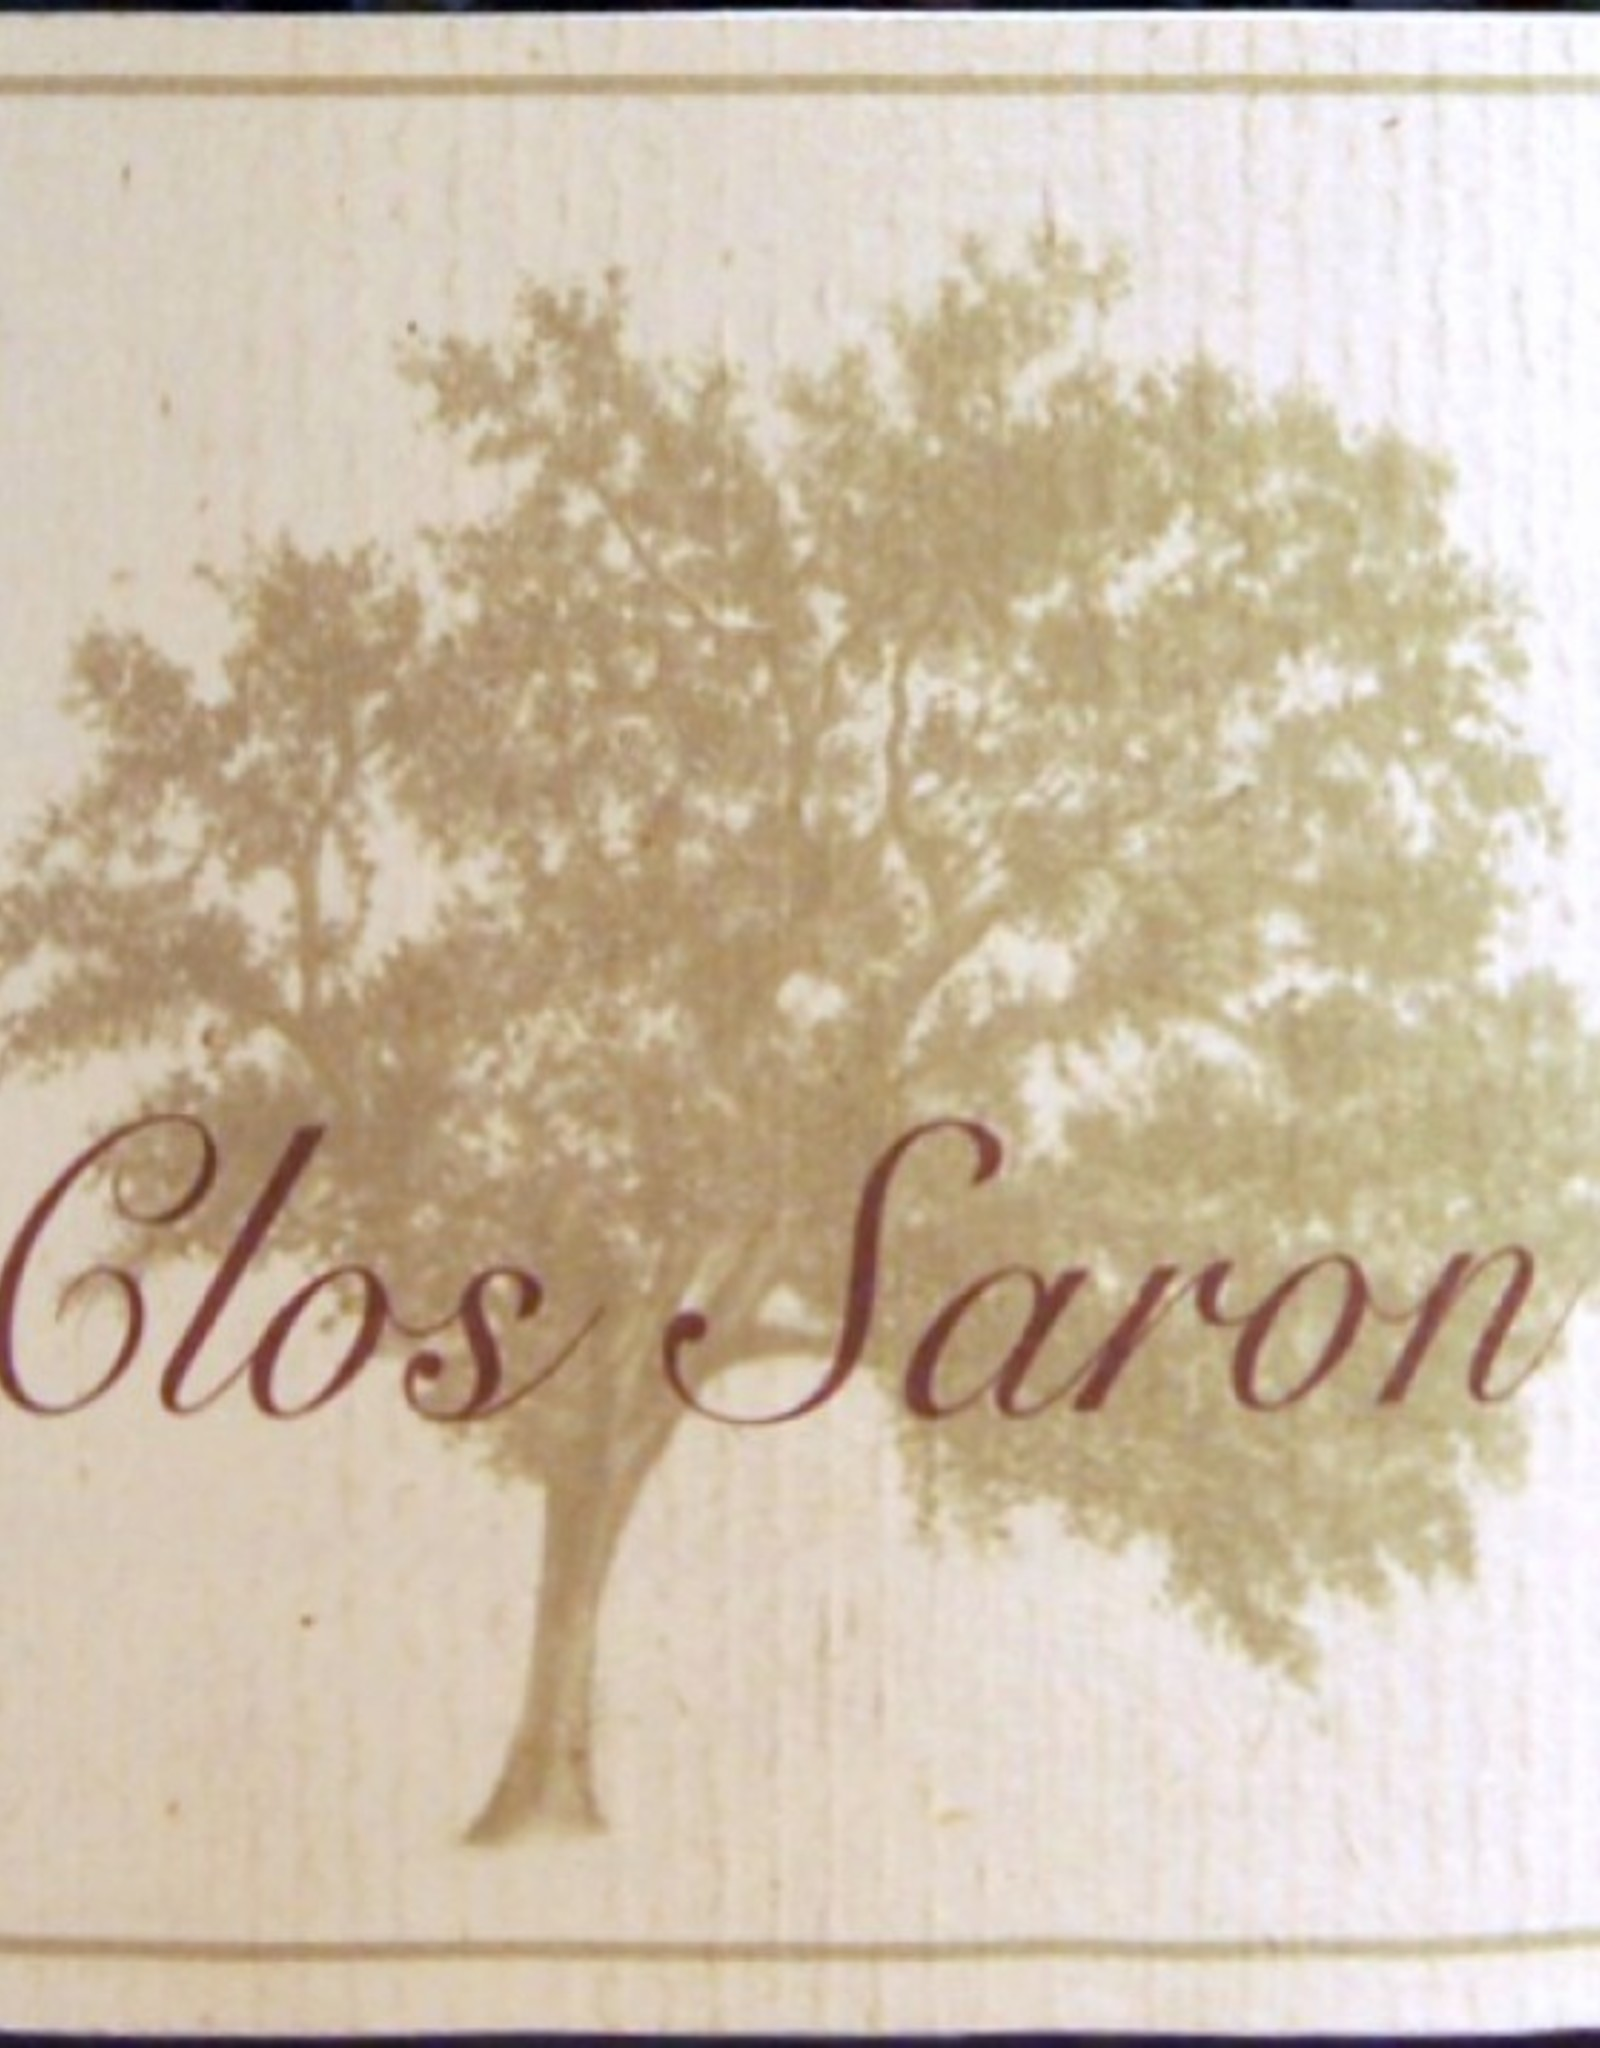 Clos Saron Tickled Noir 2018